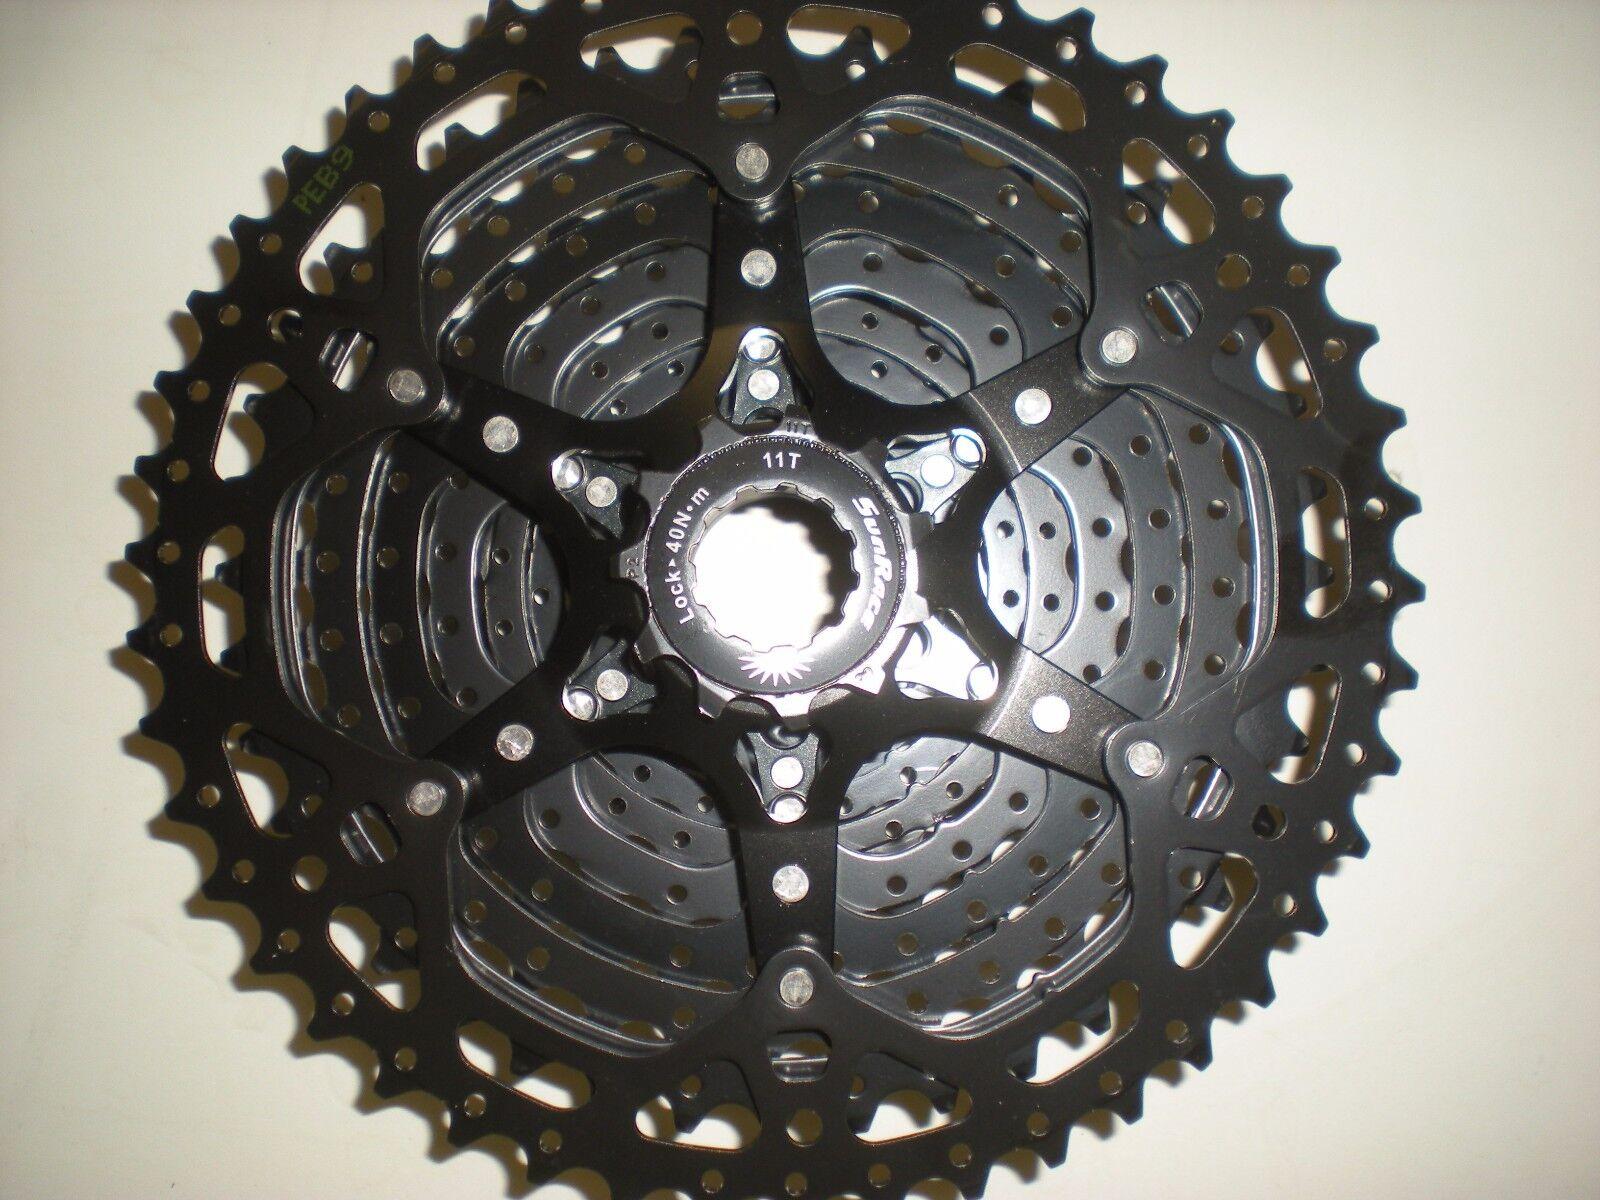 Sunrace MS8 de negro 11 velocidades amplia gama 11-46 diente Cassette Shimano/Sram negro de nuevo 4f2549